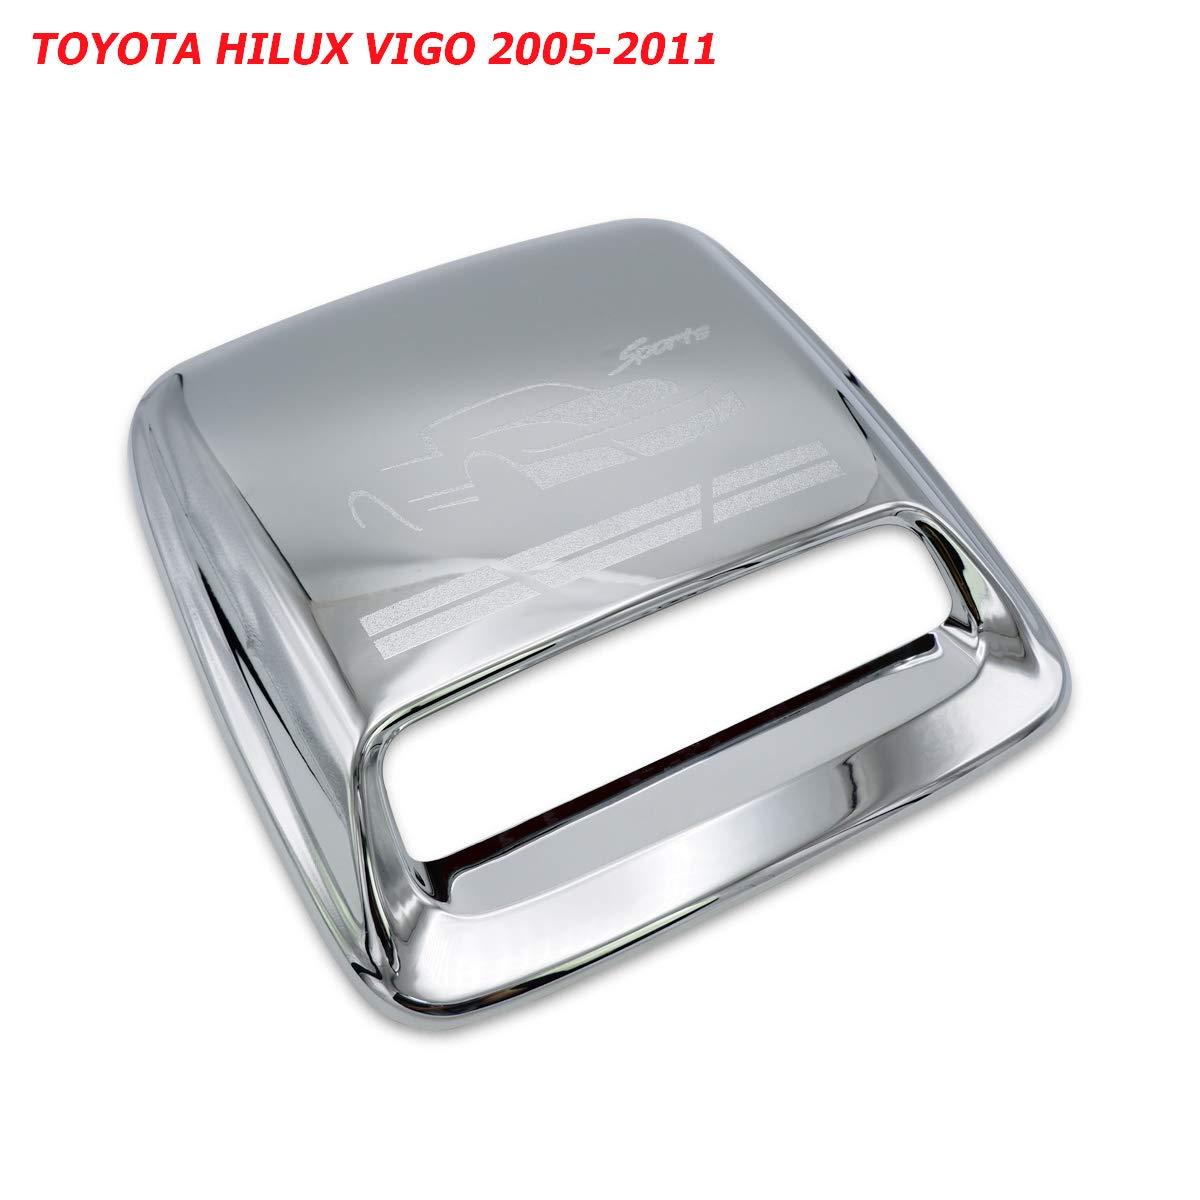 Nonstops Scoop Hood Bonnet Cover Chrome Fits Toyota Hilux Vigo Champ Fortuner 2005 2010 by Nonstops